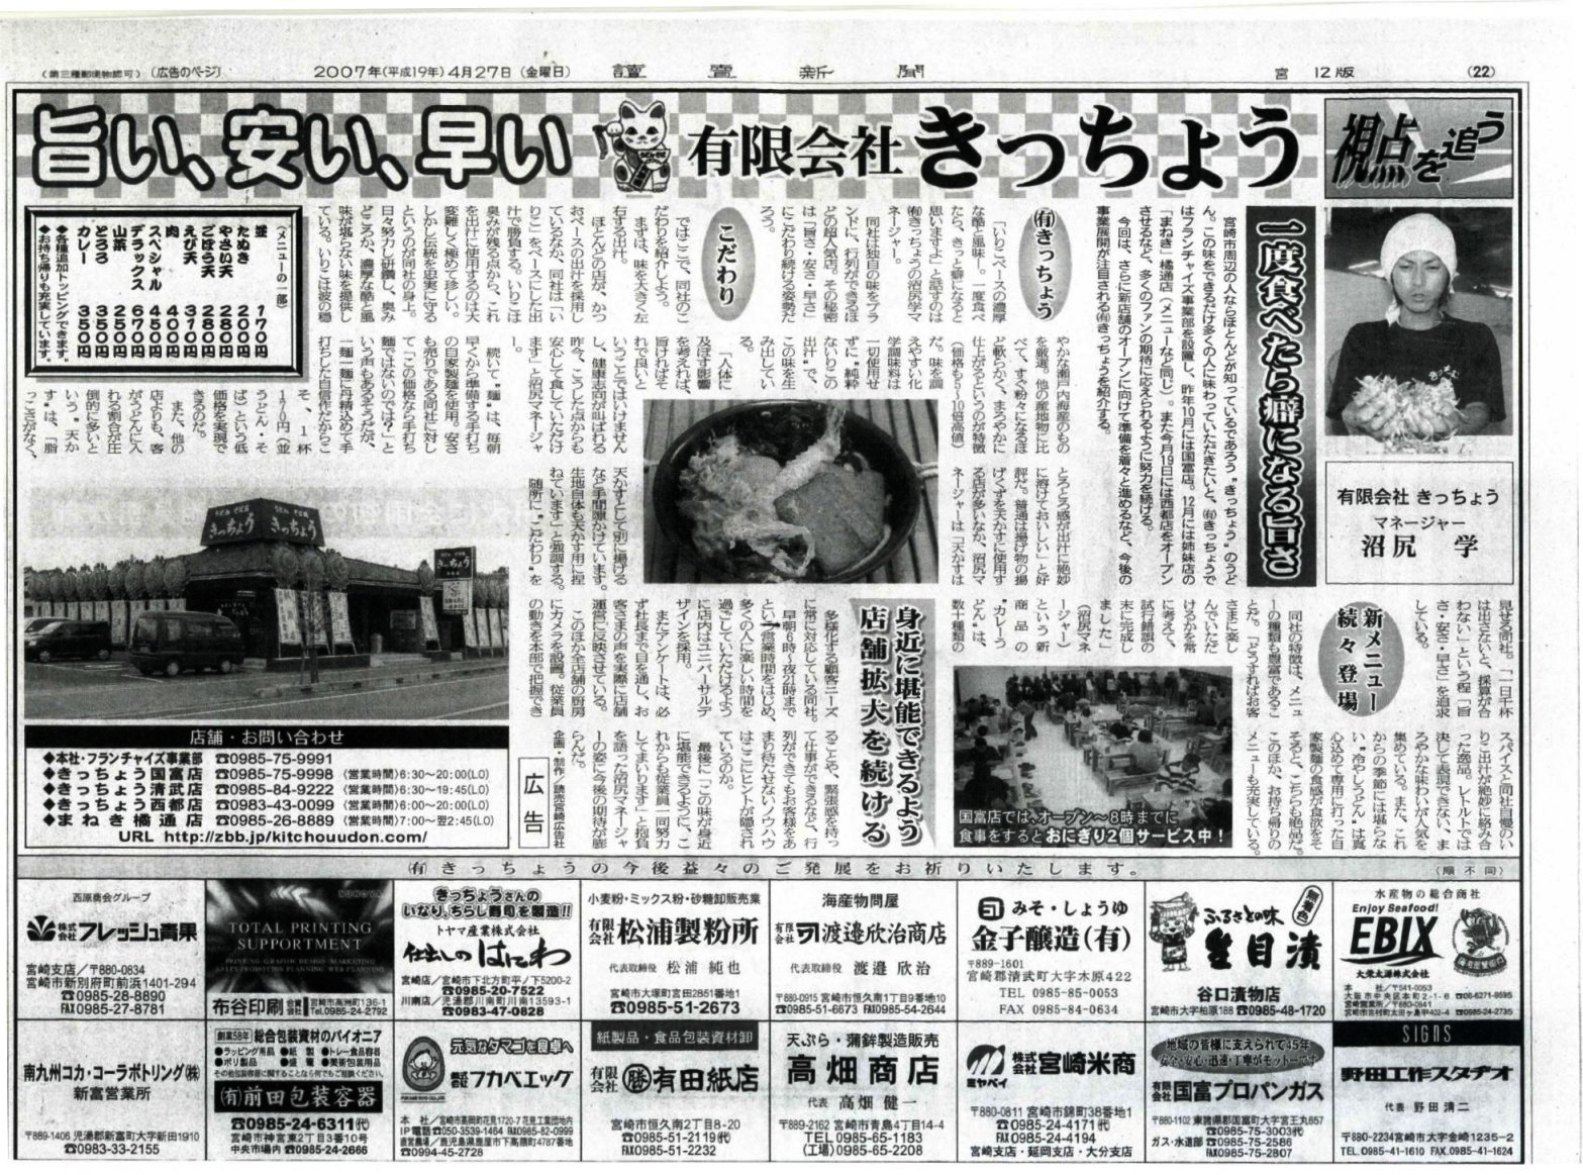 http://www.kitchouudon.com/news/2011/02/05/upload_images/EPSON002.JPG